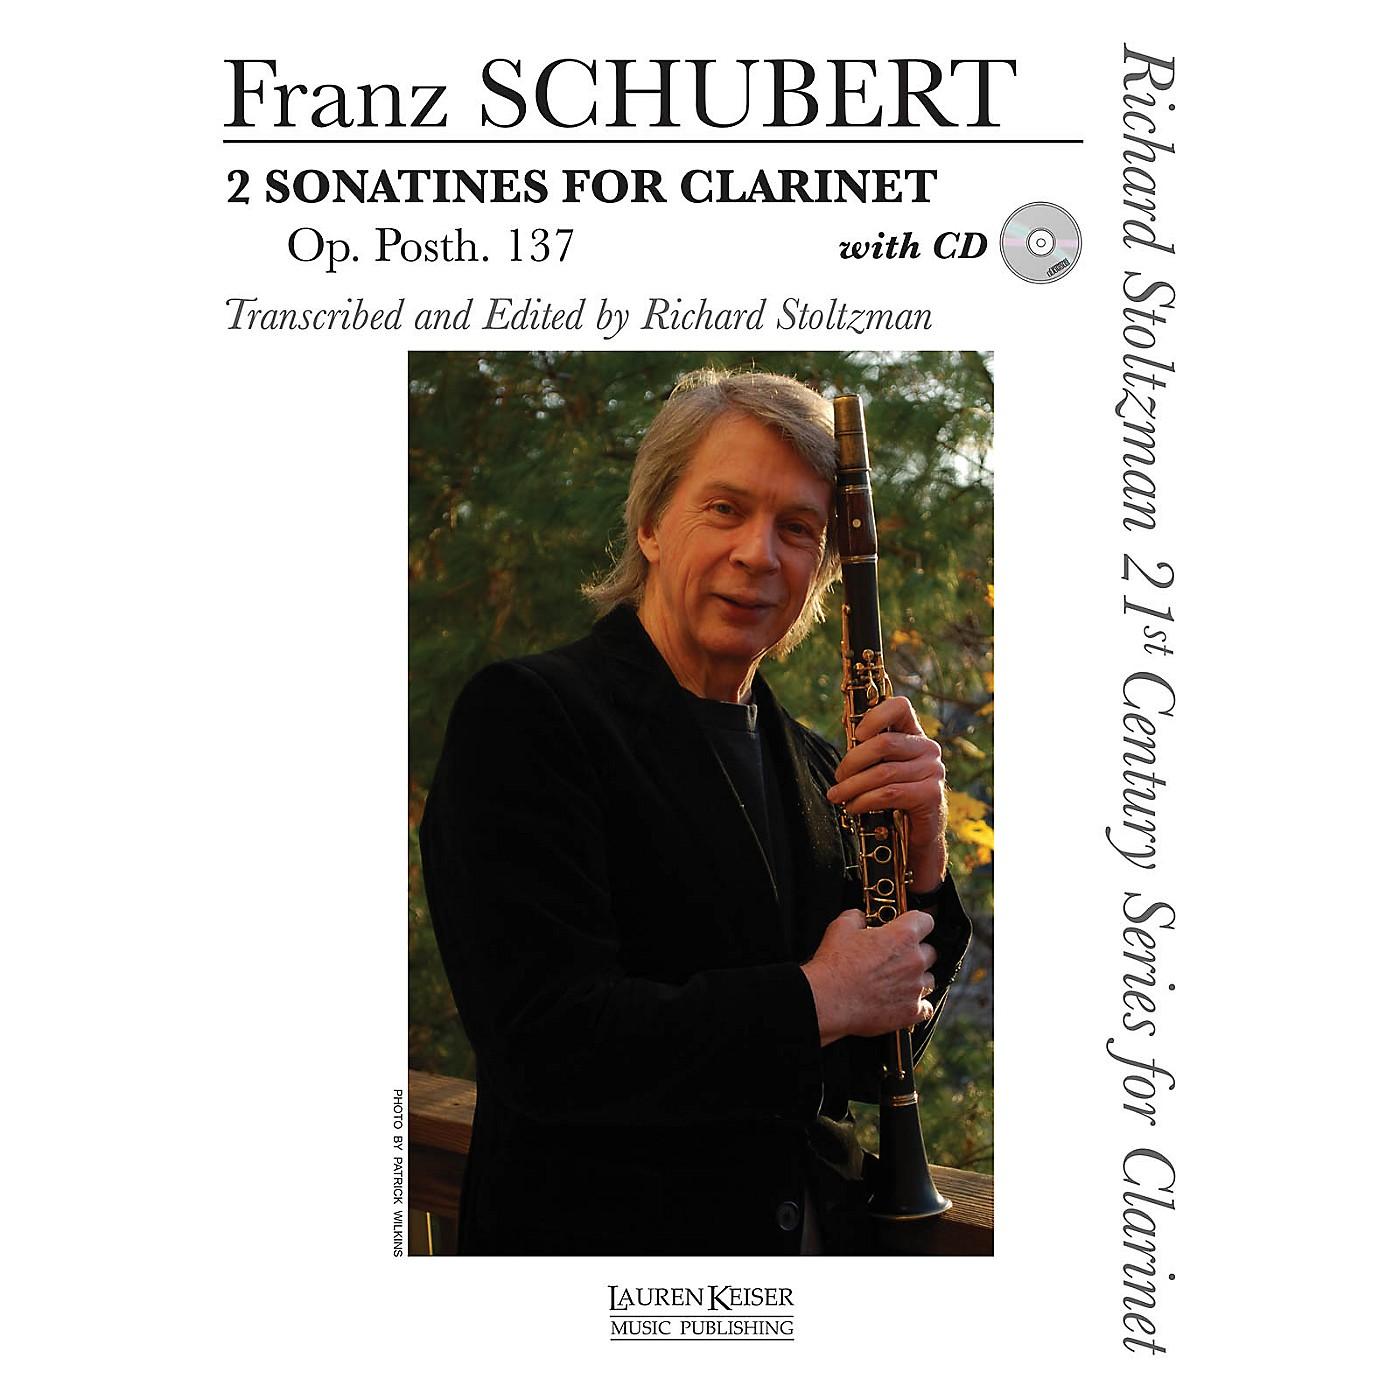 Lauren Keiser Music Publishing 2 Sonatines for Clarinet, Op. post. 137 LKM Music BK/CD Composed by Schubert Edited by Richard Stoltzman thumbnail